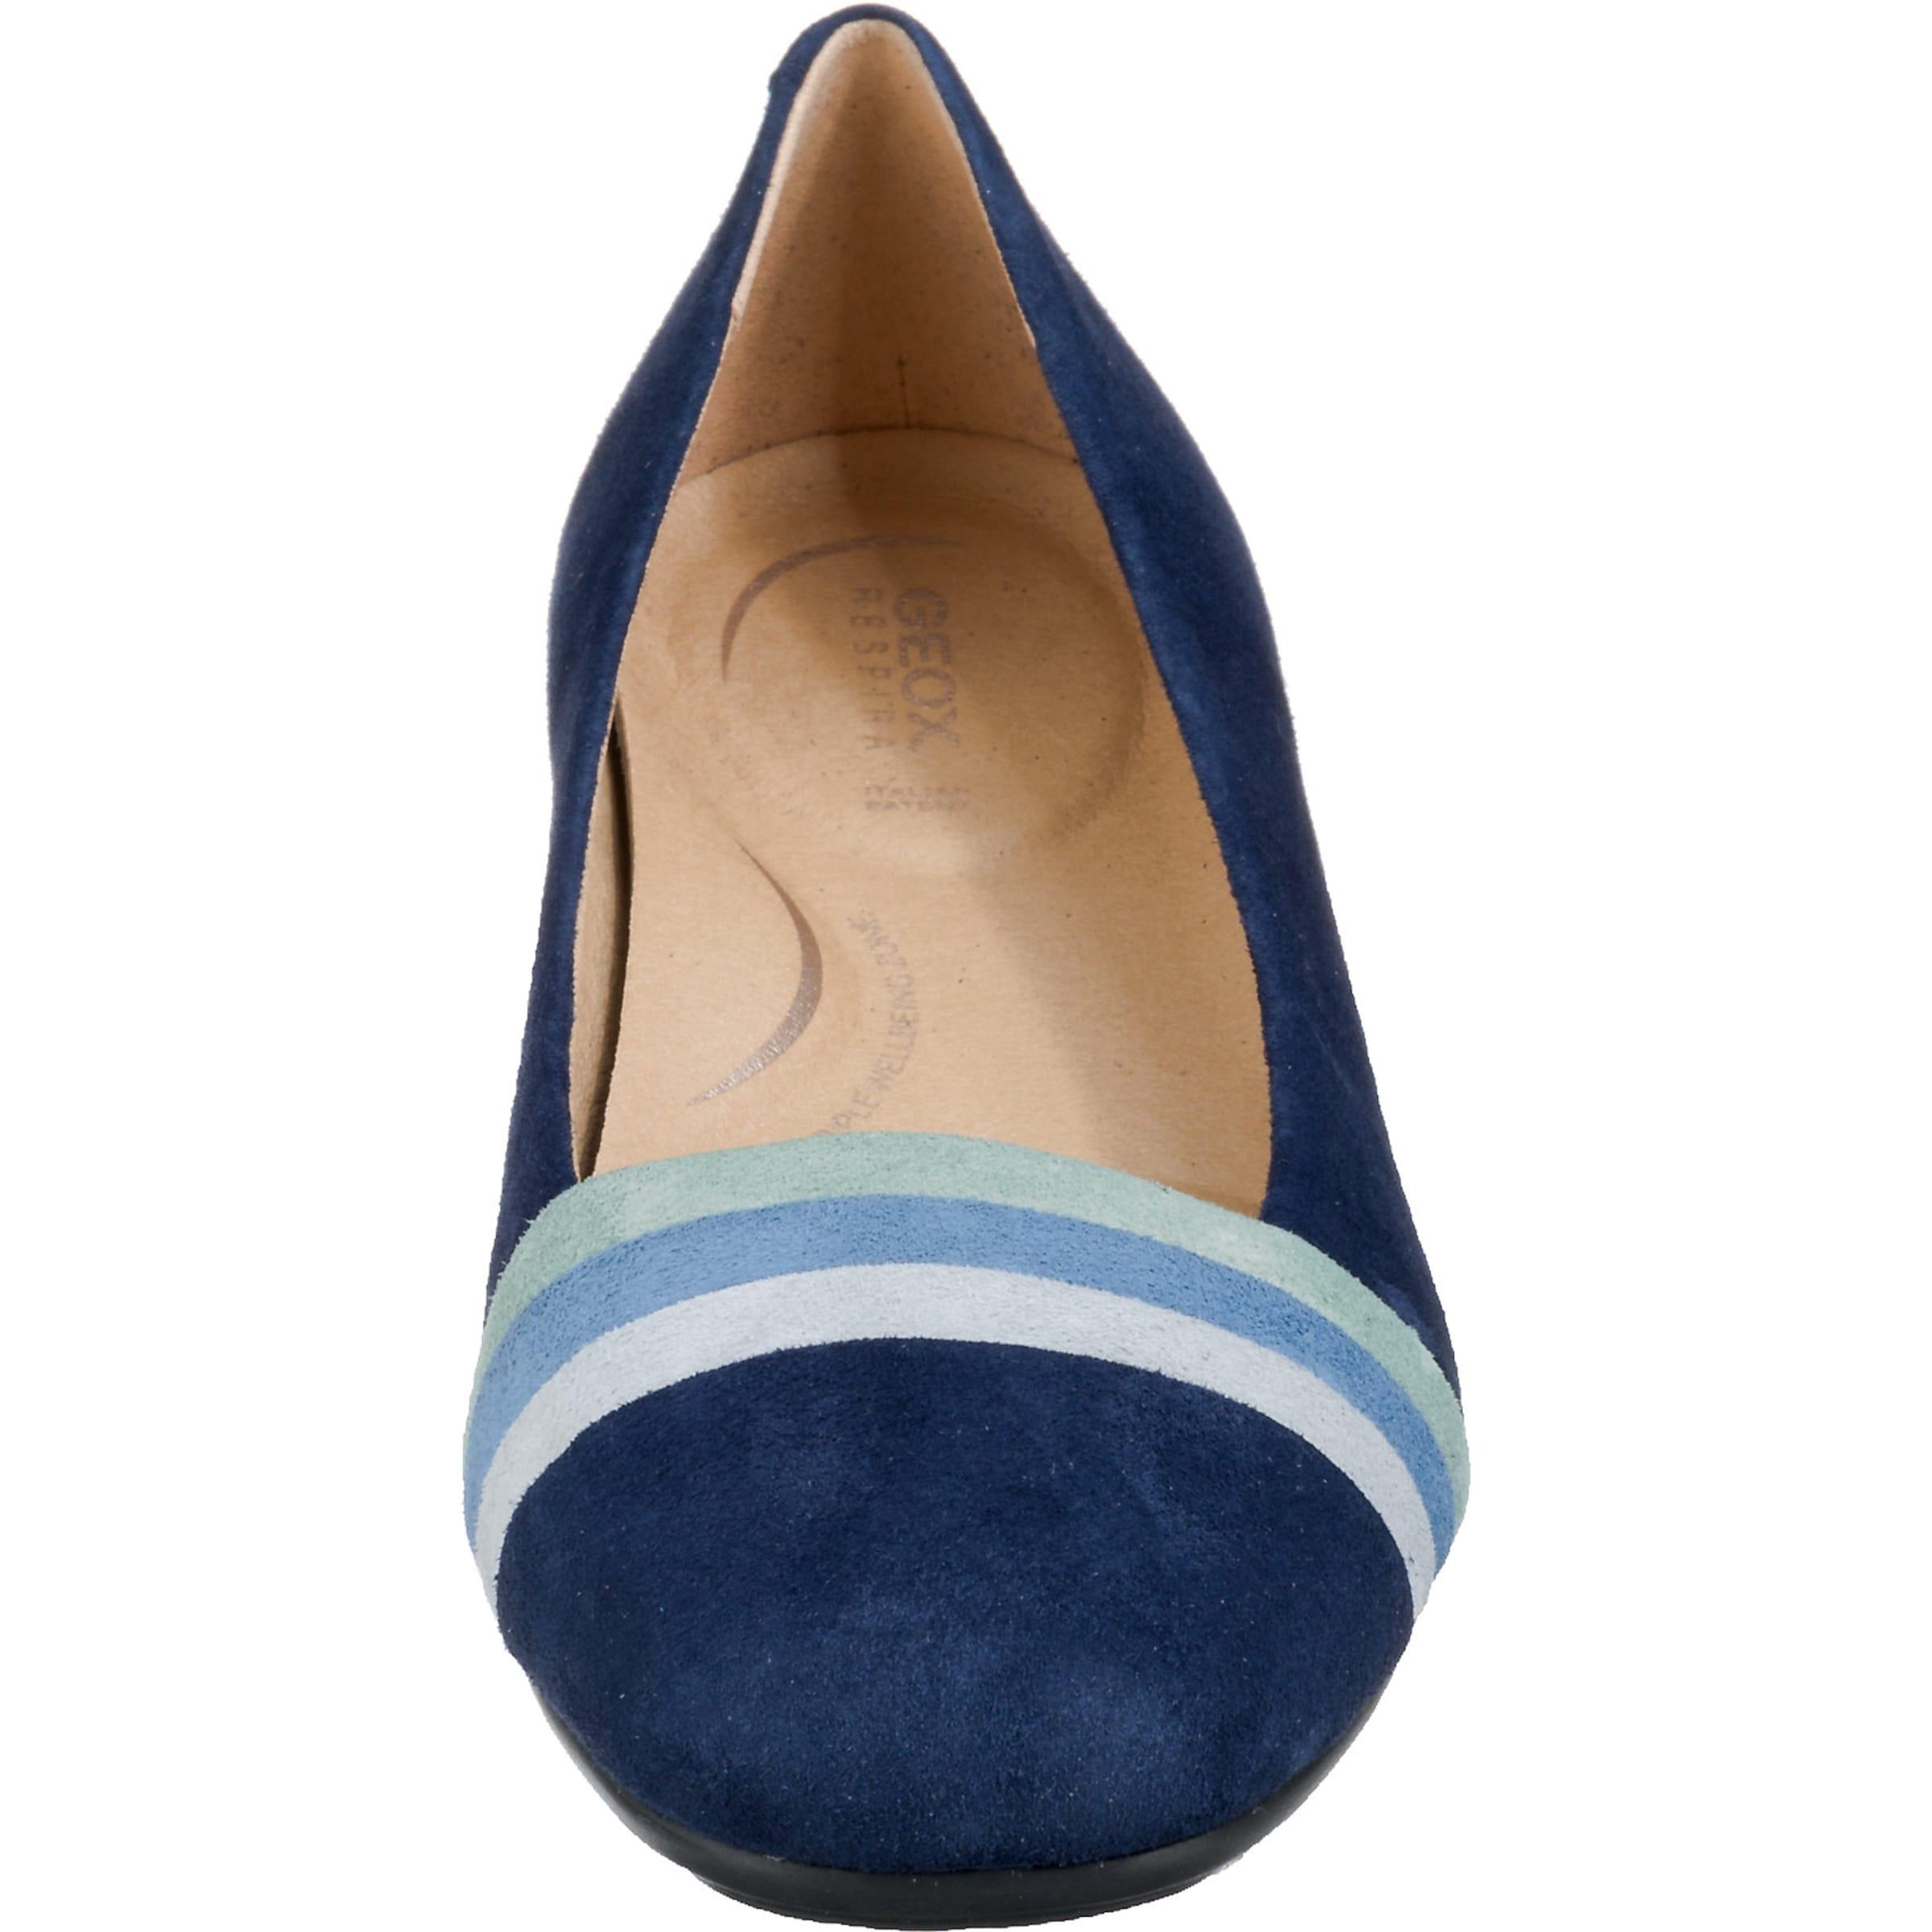 Ballerina 'd Hellblau Geox Annytah' In Pastellgrün BlauOpal wkPZiTOuX